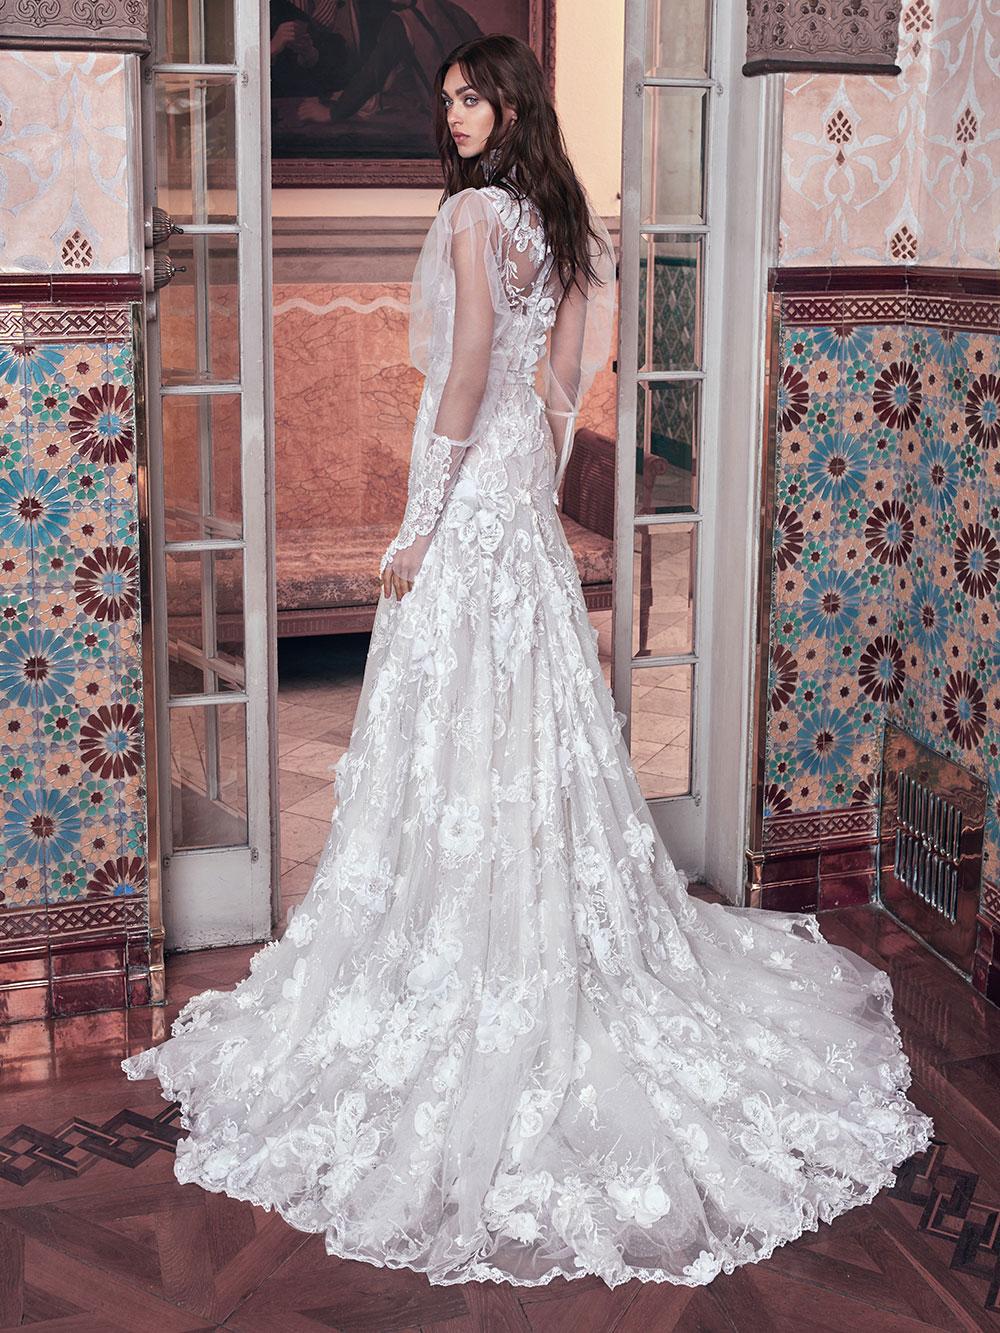 Laura - Galia Lahav Spring 2018 Collection. www.theweddingnotebook.com